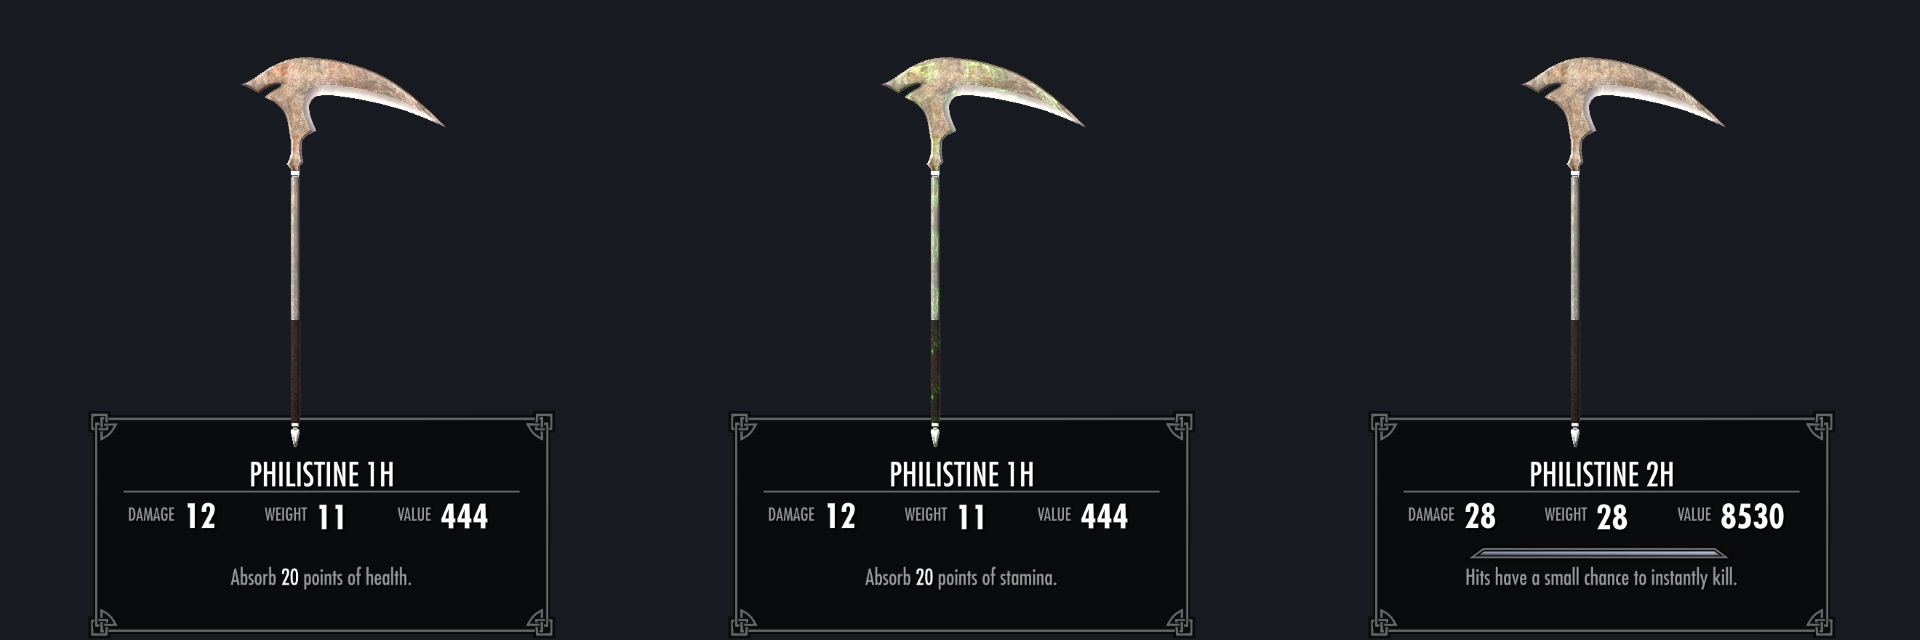 KukatsuoSteelScytheSK 013-1 Info 2HA Philistine 2